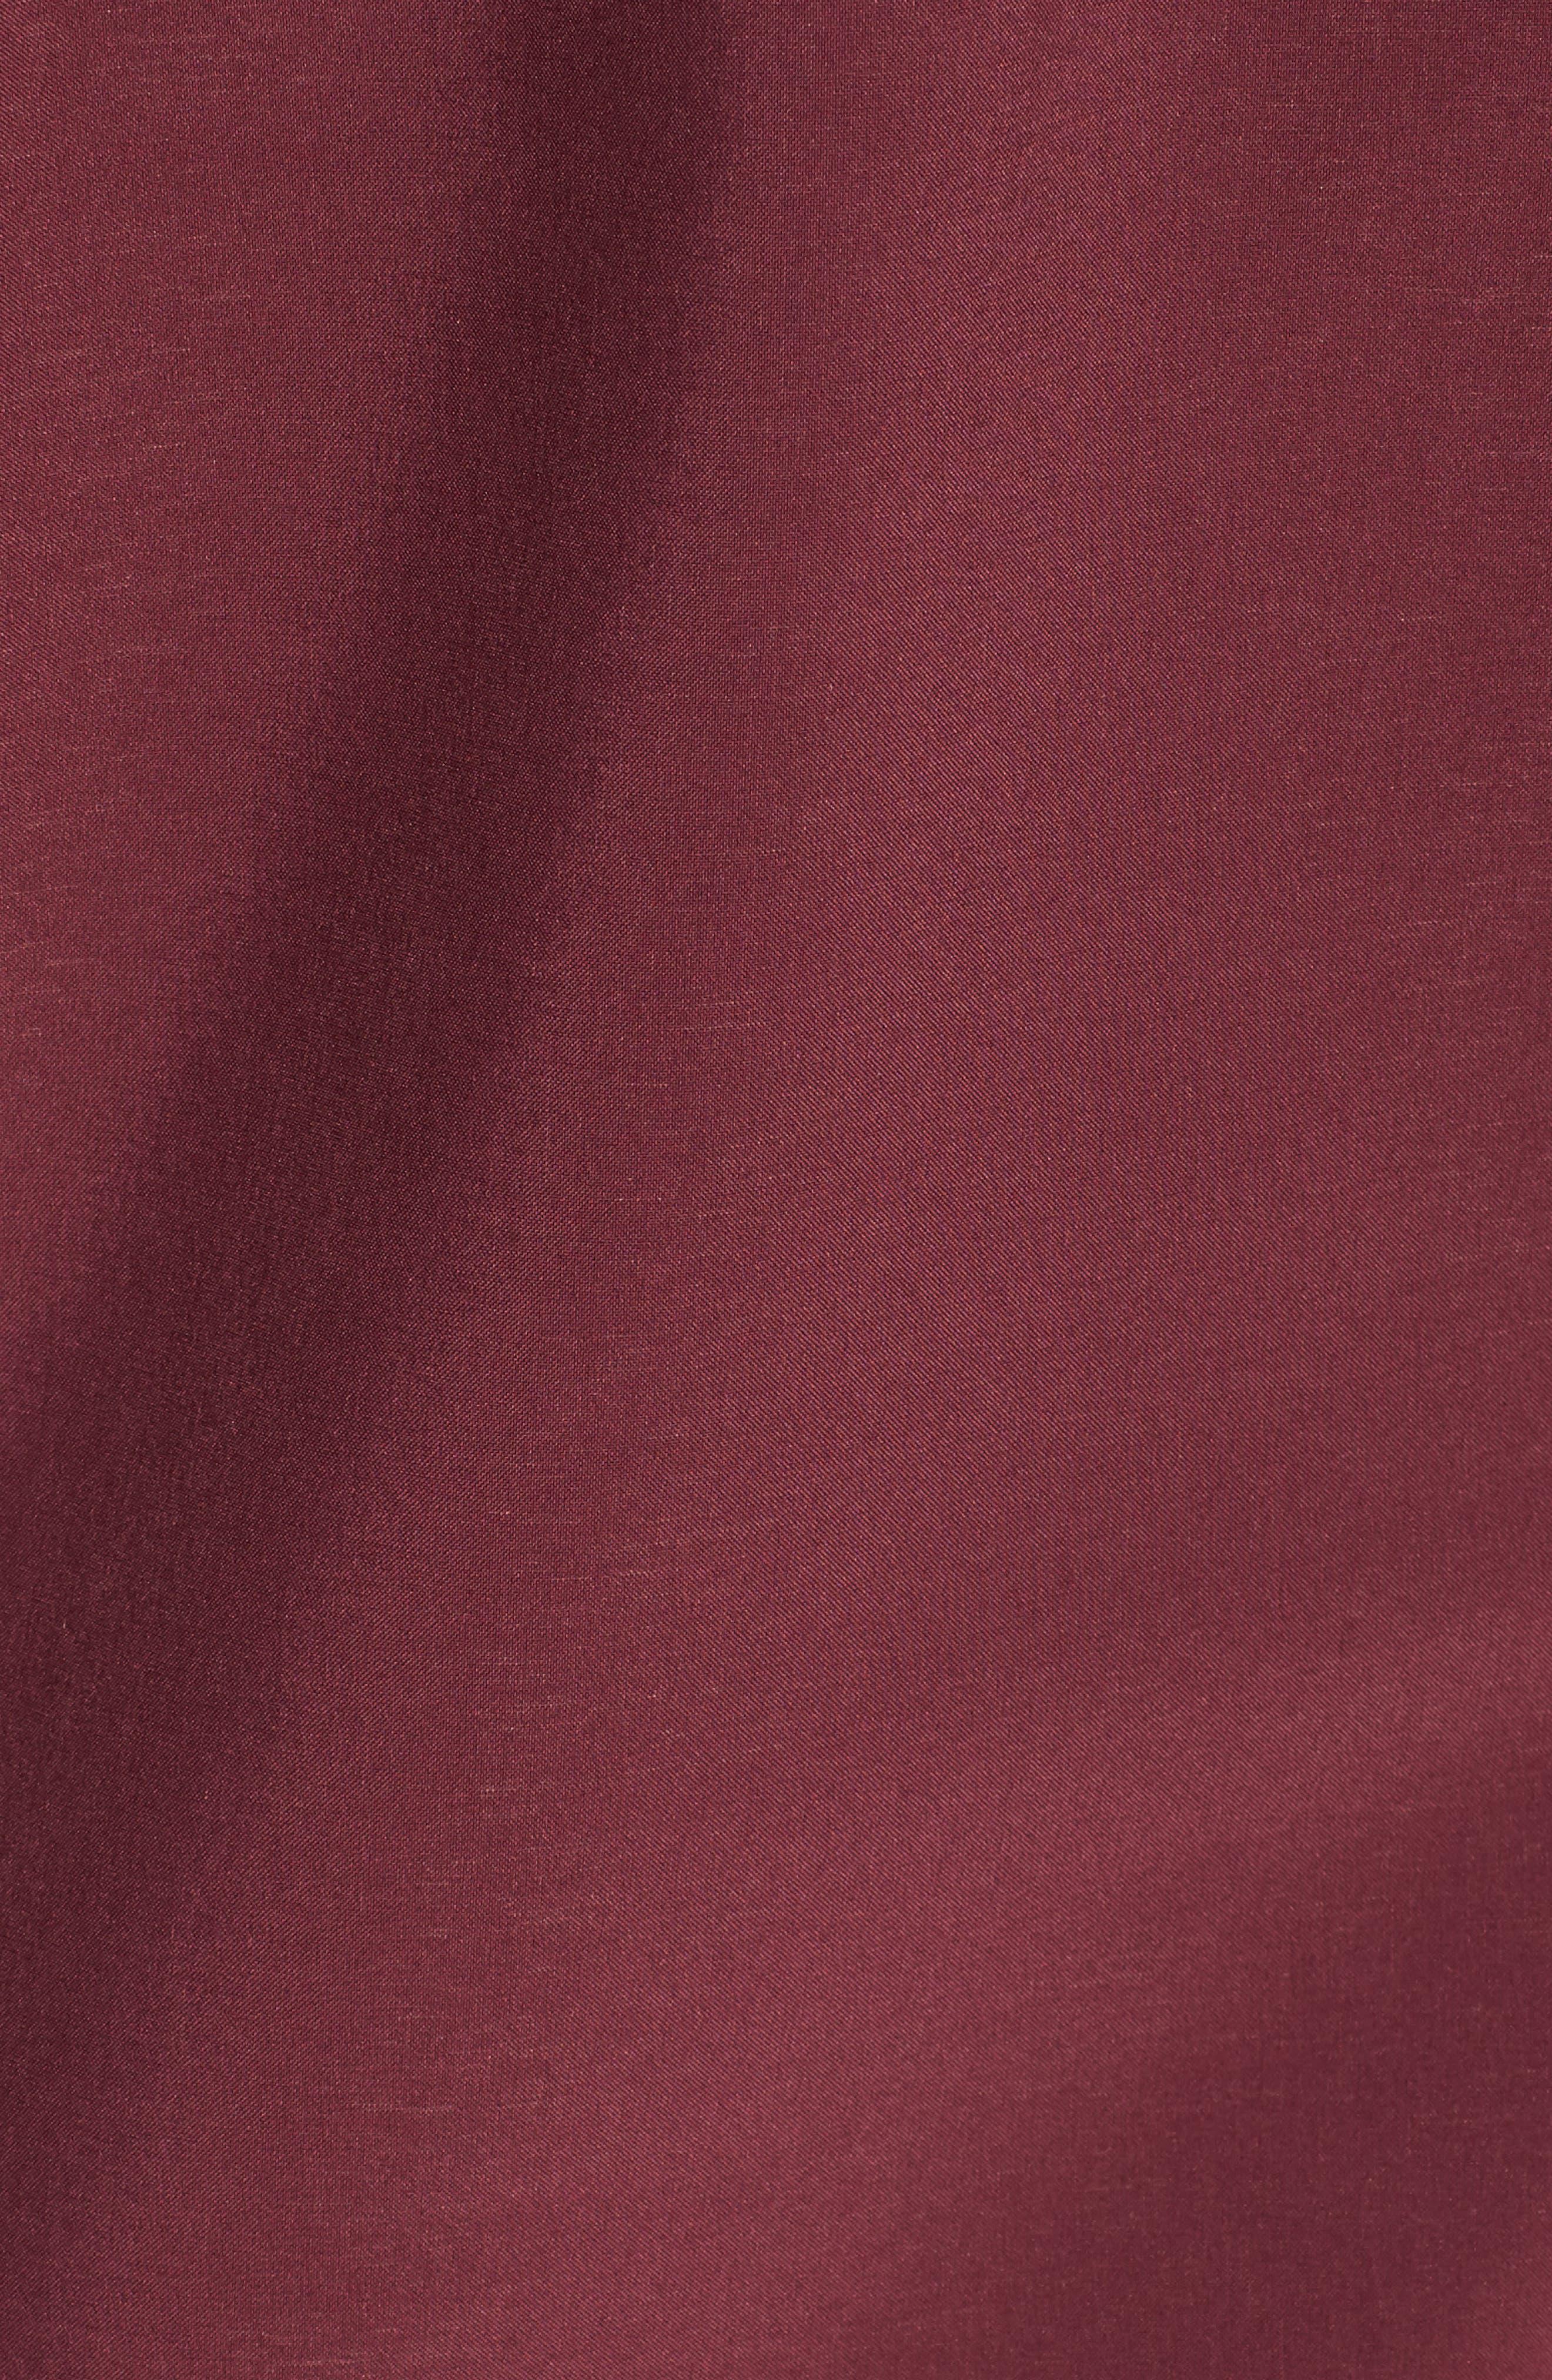 Apex Bionic Grace Jacket,                             Alternate thumbnail 6, color,                             Fig